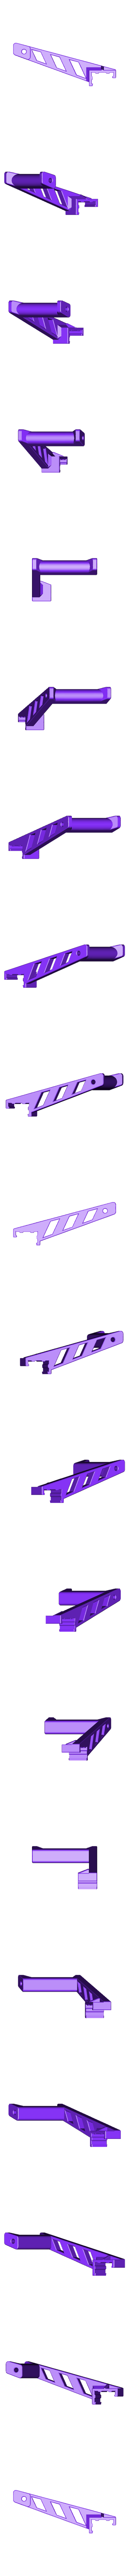 SpoolHolder_Bear.stl Download free STL file Spool Holder for 2040 profile • 3D printing object, JBertotto